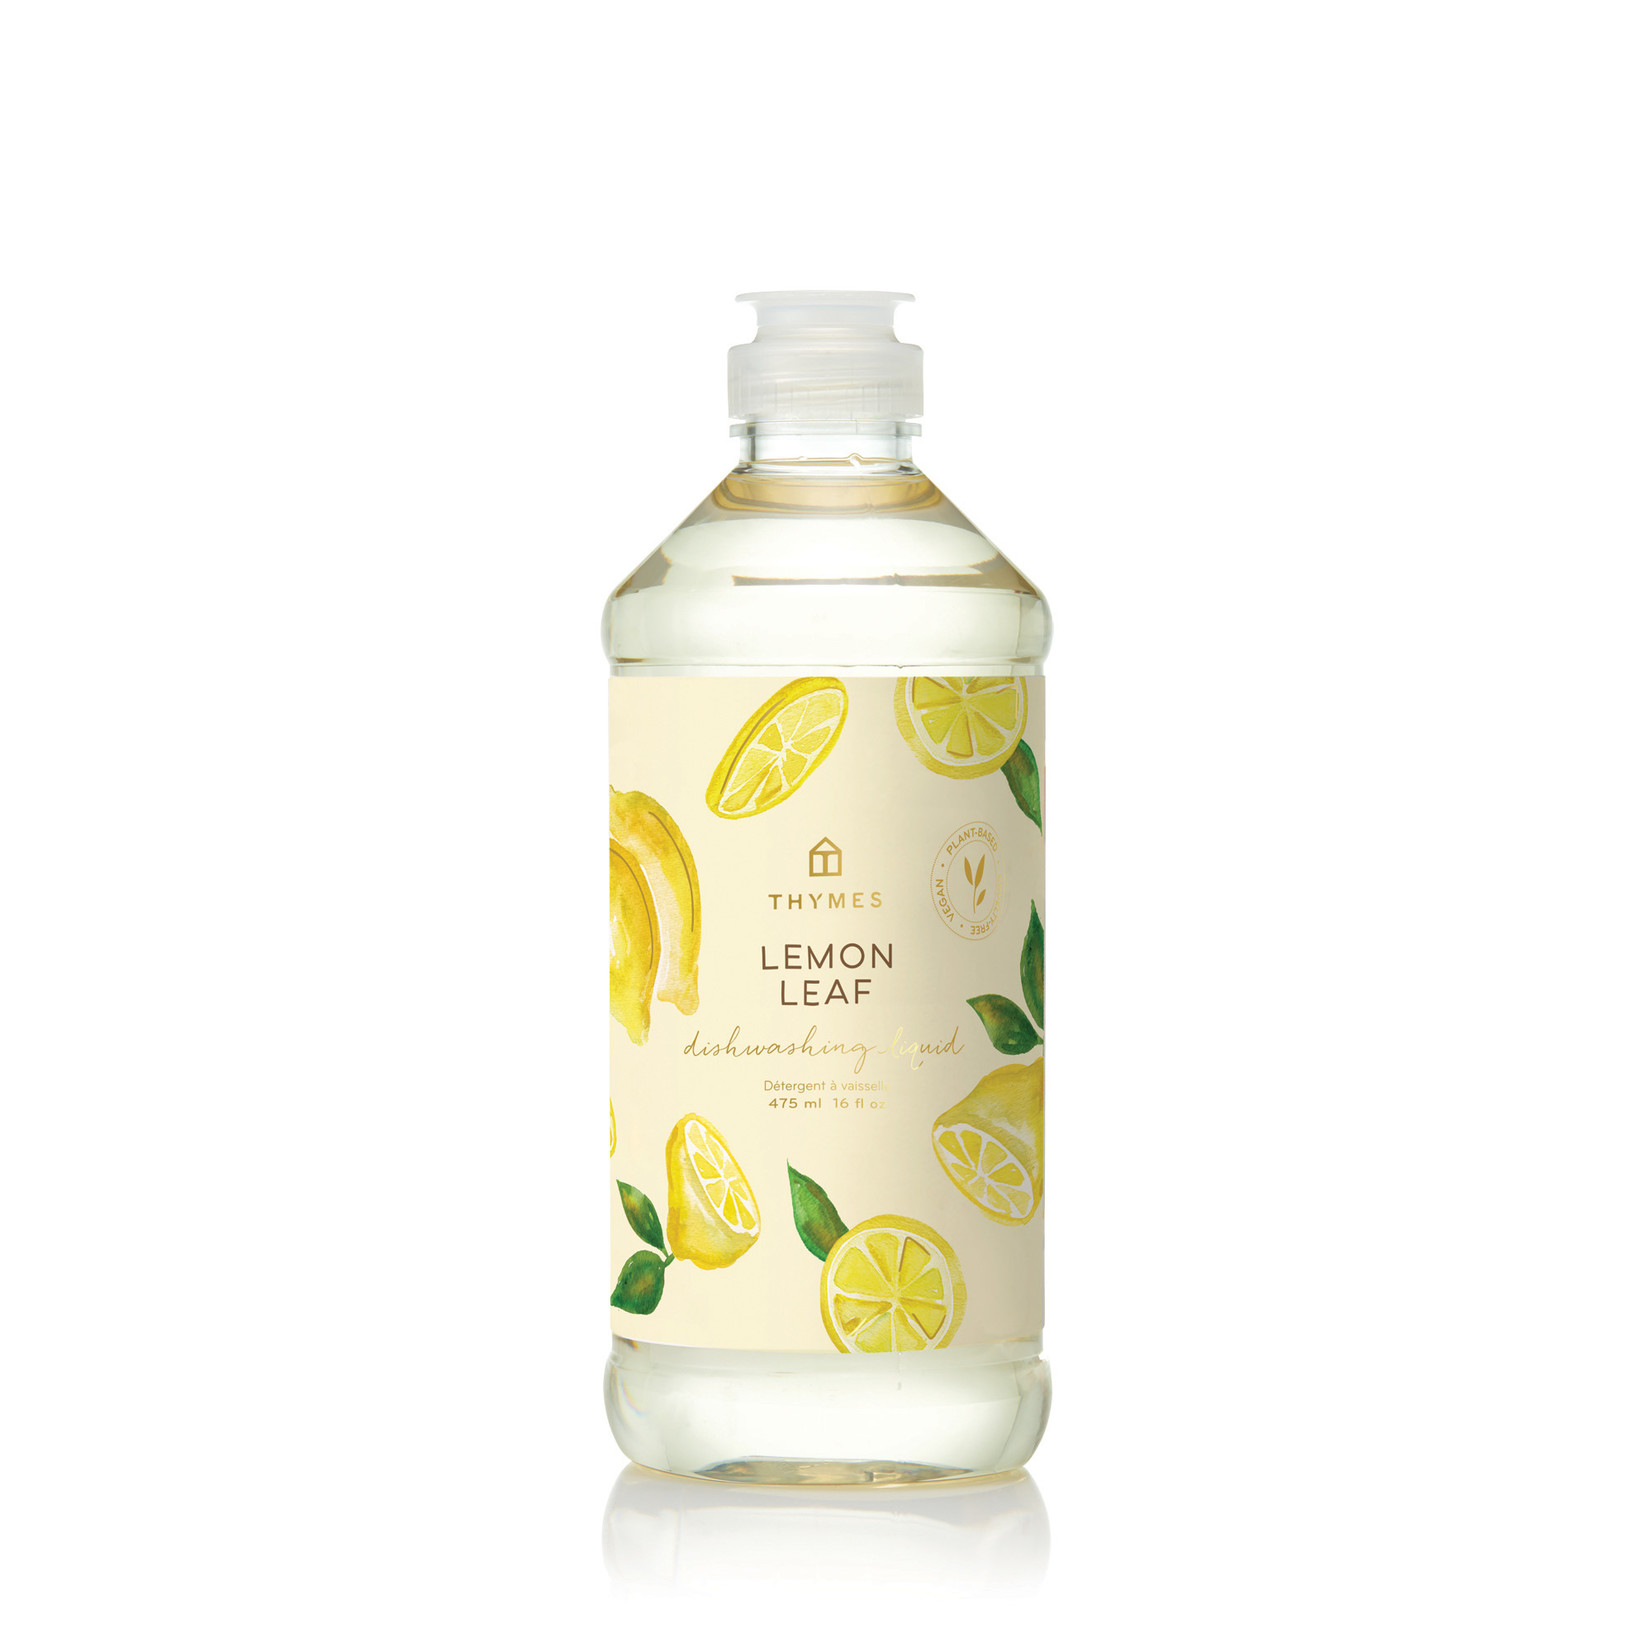 Thymes Lemon Leaf Dishwashing Liquid